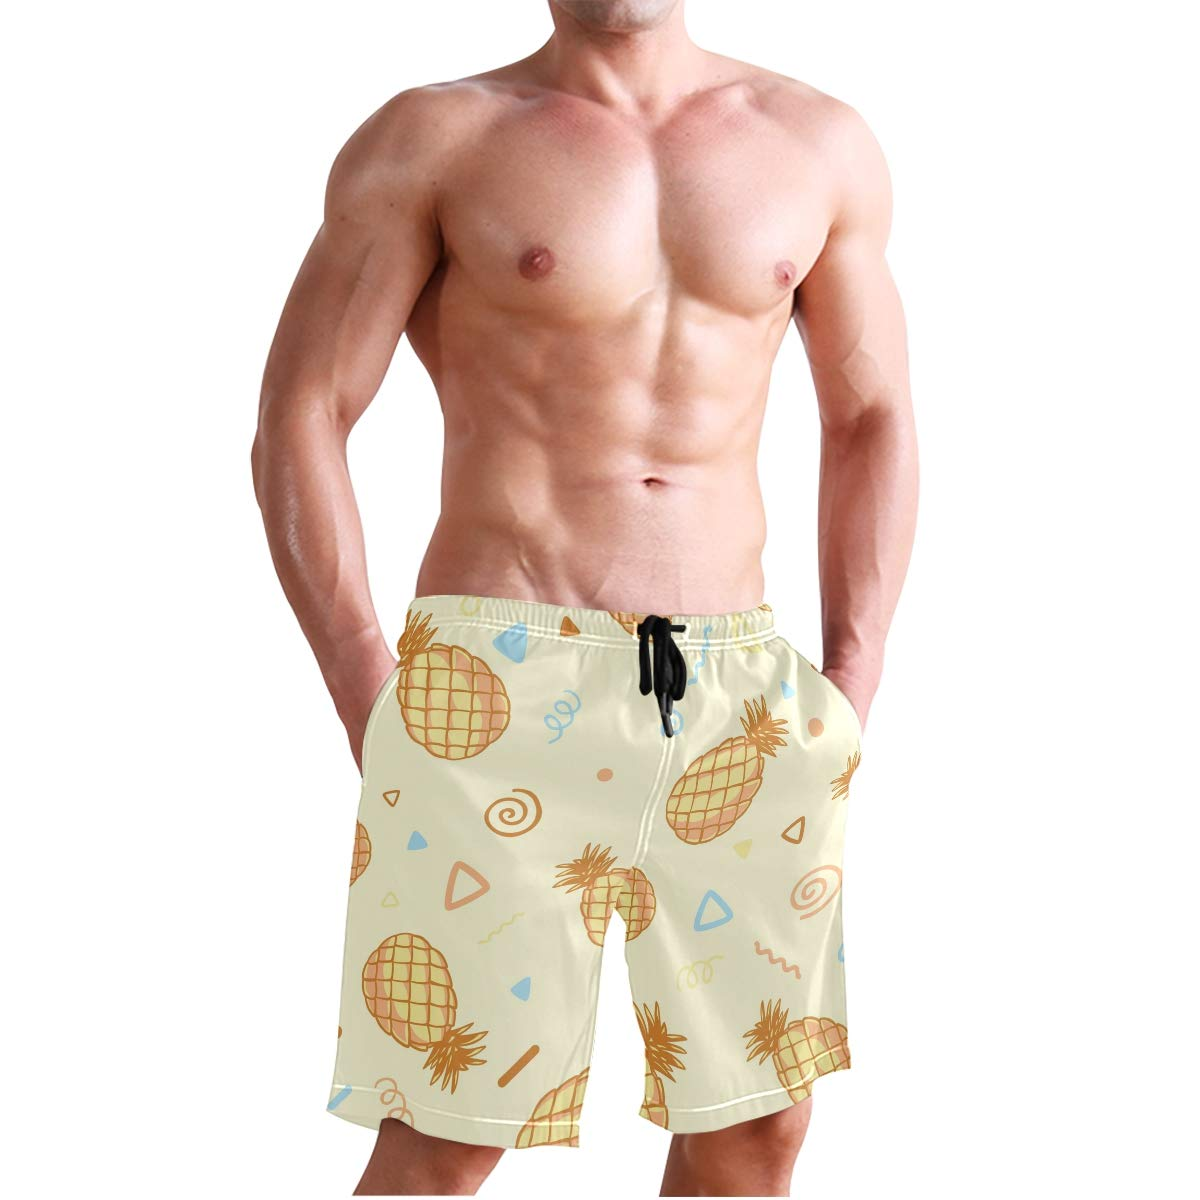 DEYYA Mens Bright Pineapple Fruits Swim Trunks Beachwear Summer Holiday Beach Shorts Quick Dry